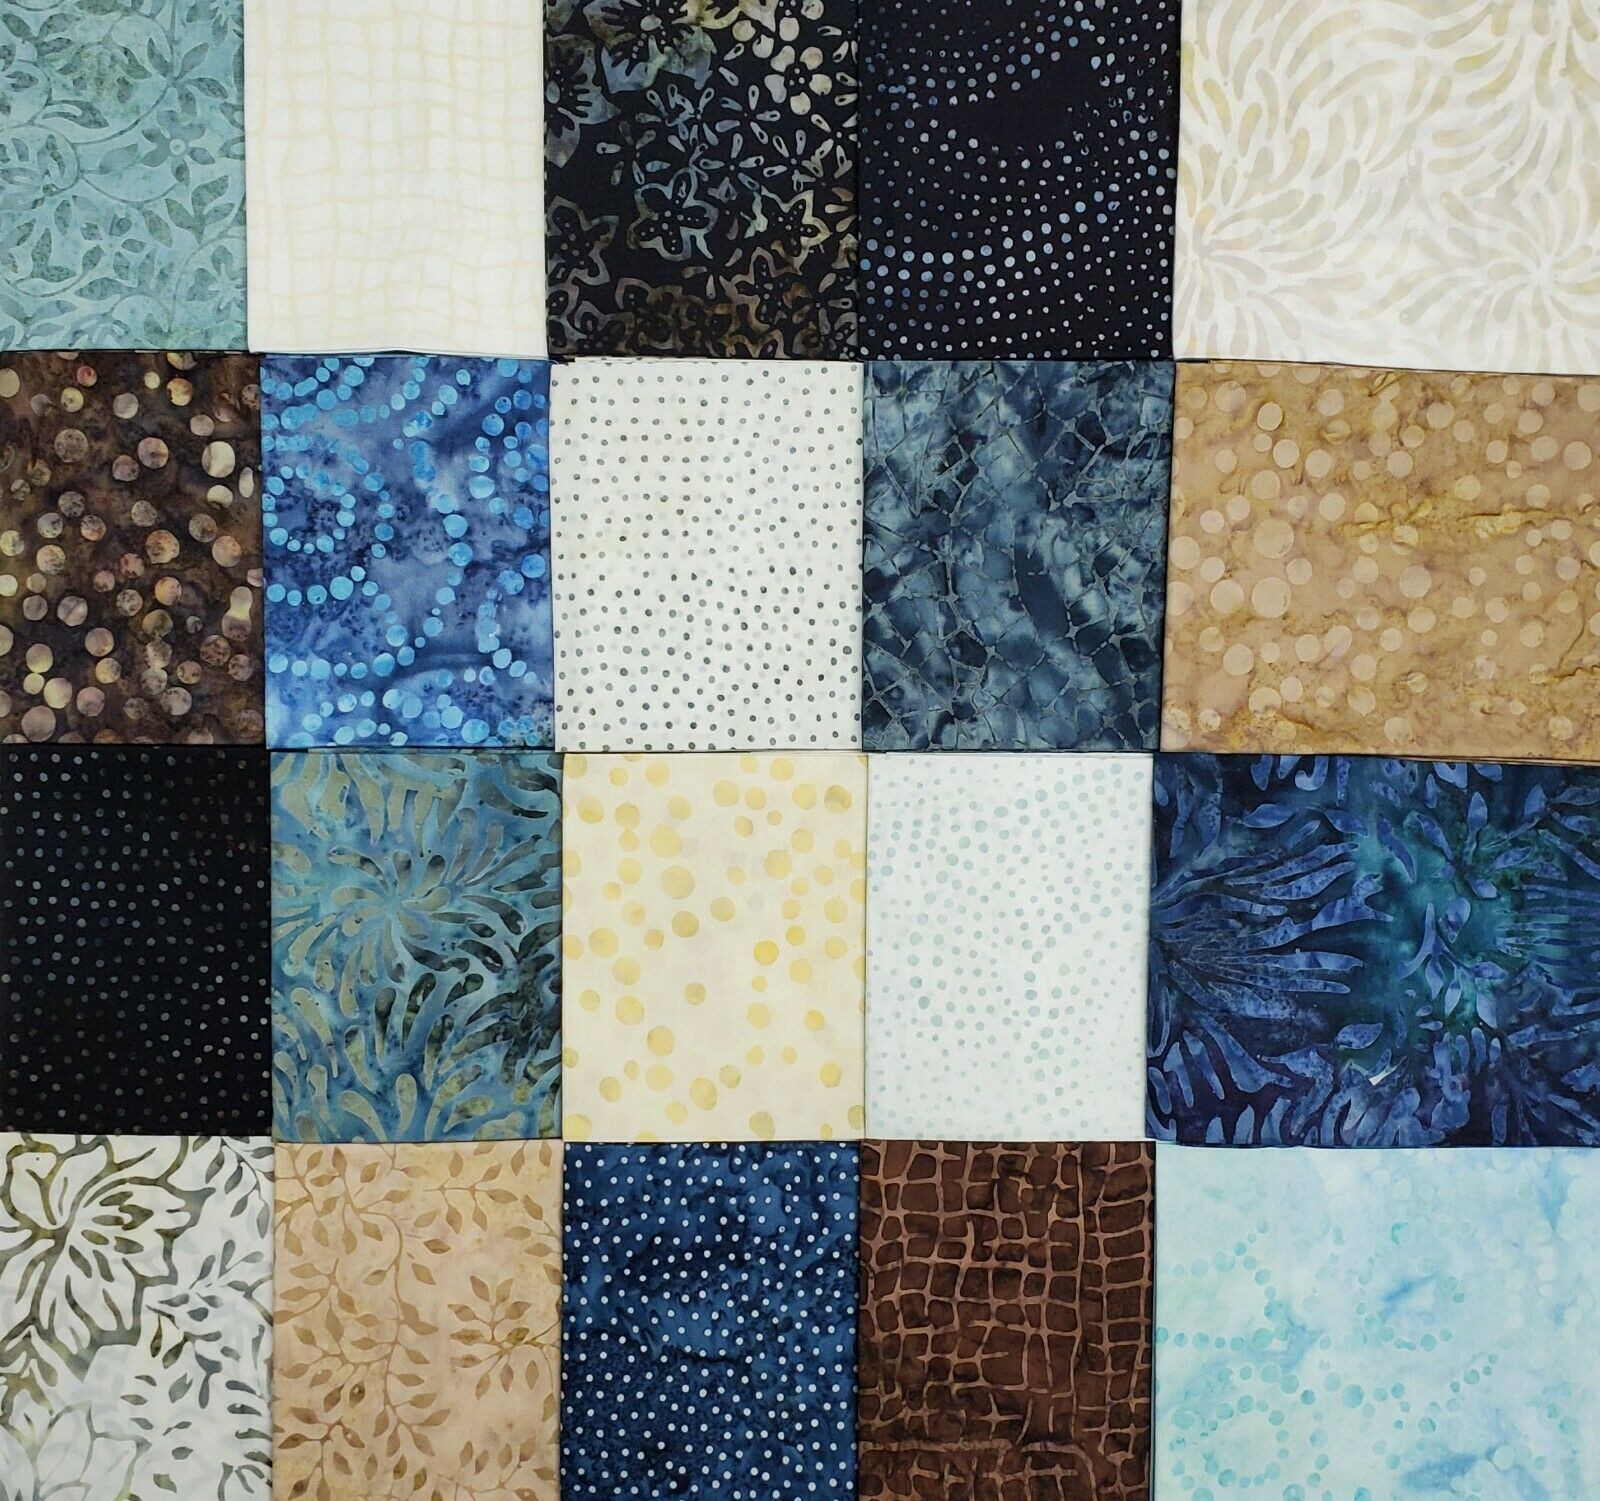 Hibiscus Paradise Boundless 20PC Half Yard Bundle 100/% Cotton Batik Fabric Bundles Sundance Joy